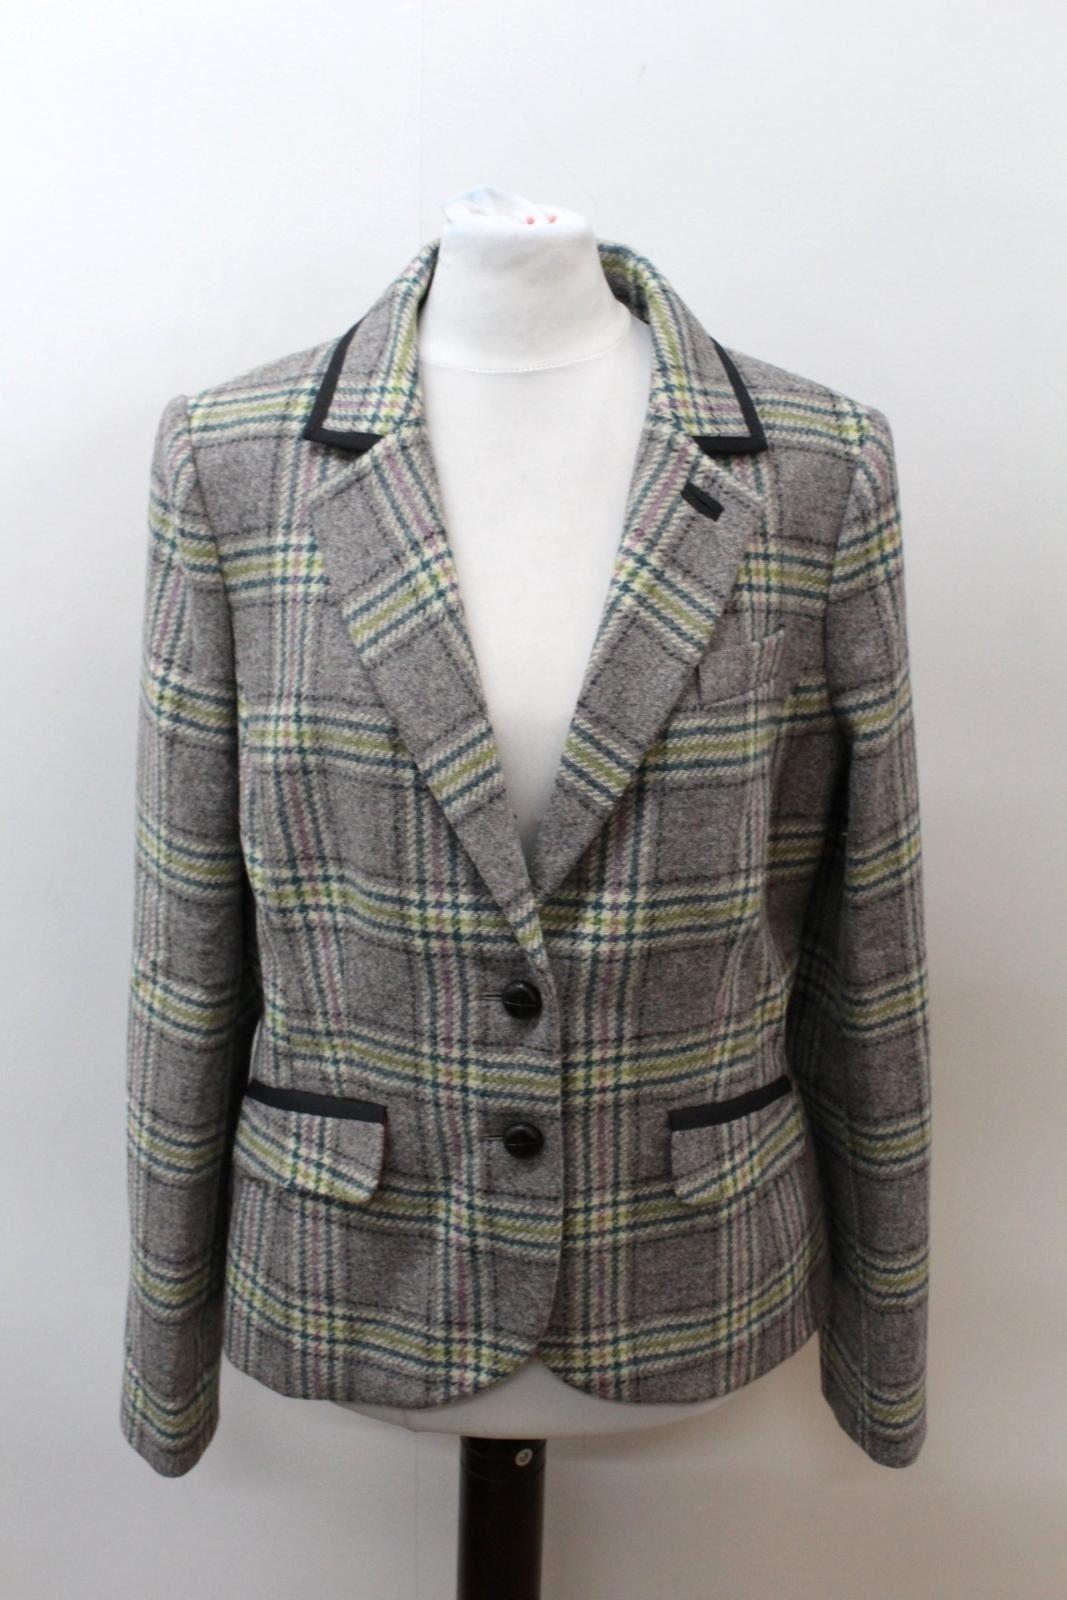 BODEN-Ladies-Grey-Green-Wool-Single-Breasted-Checked-Blazer-Jacket-UK14-EU42